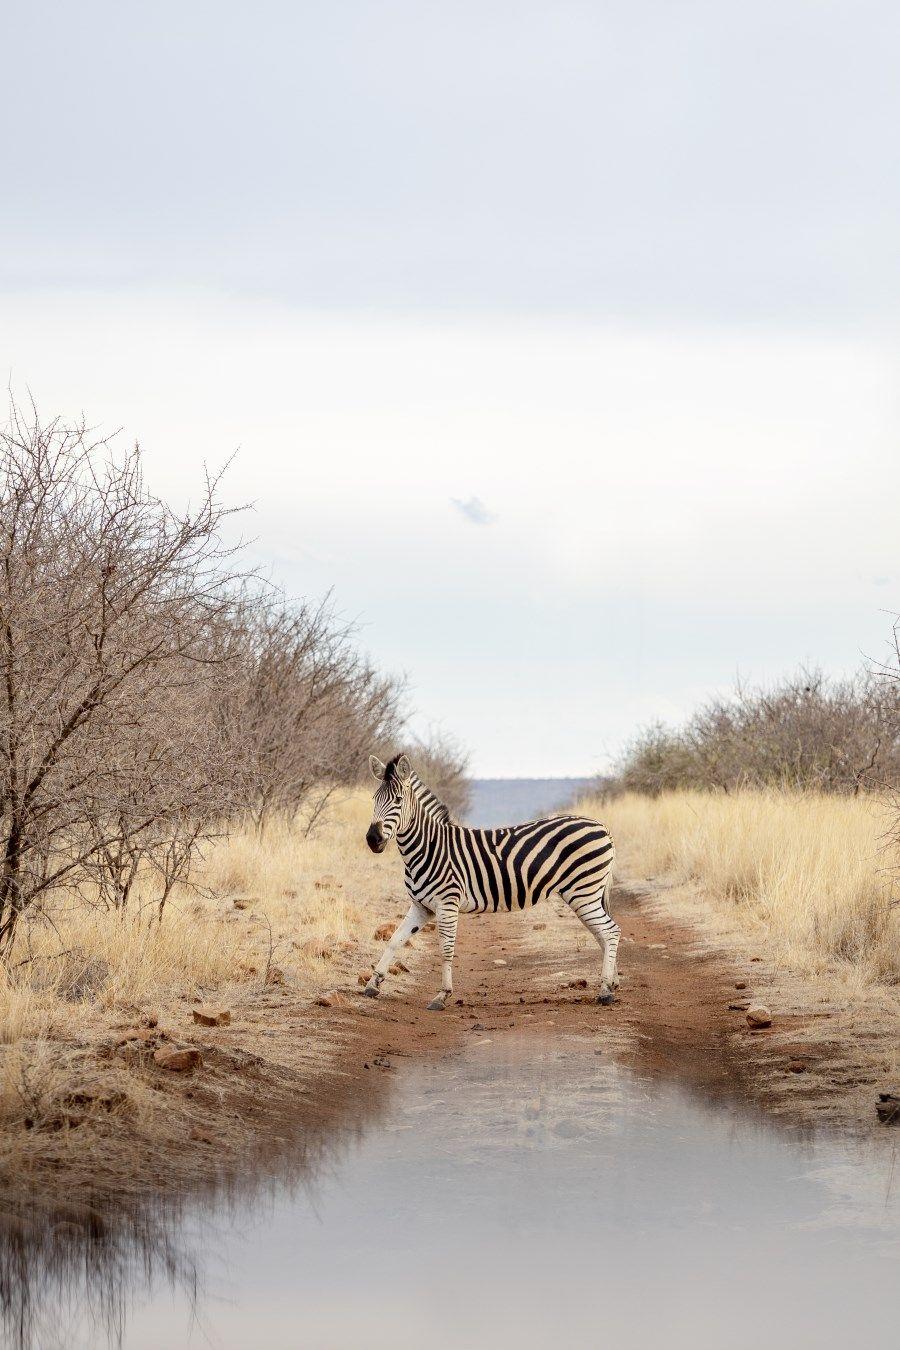 Wildlife Photography Tips for an African Safari Adventure